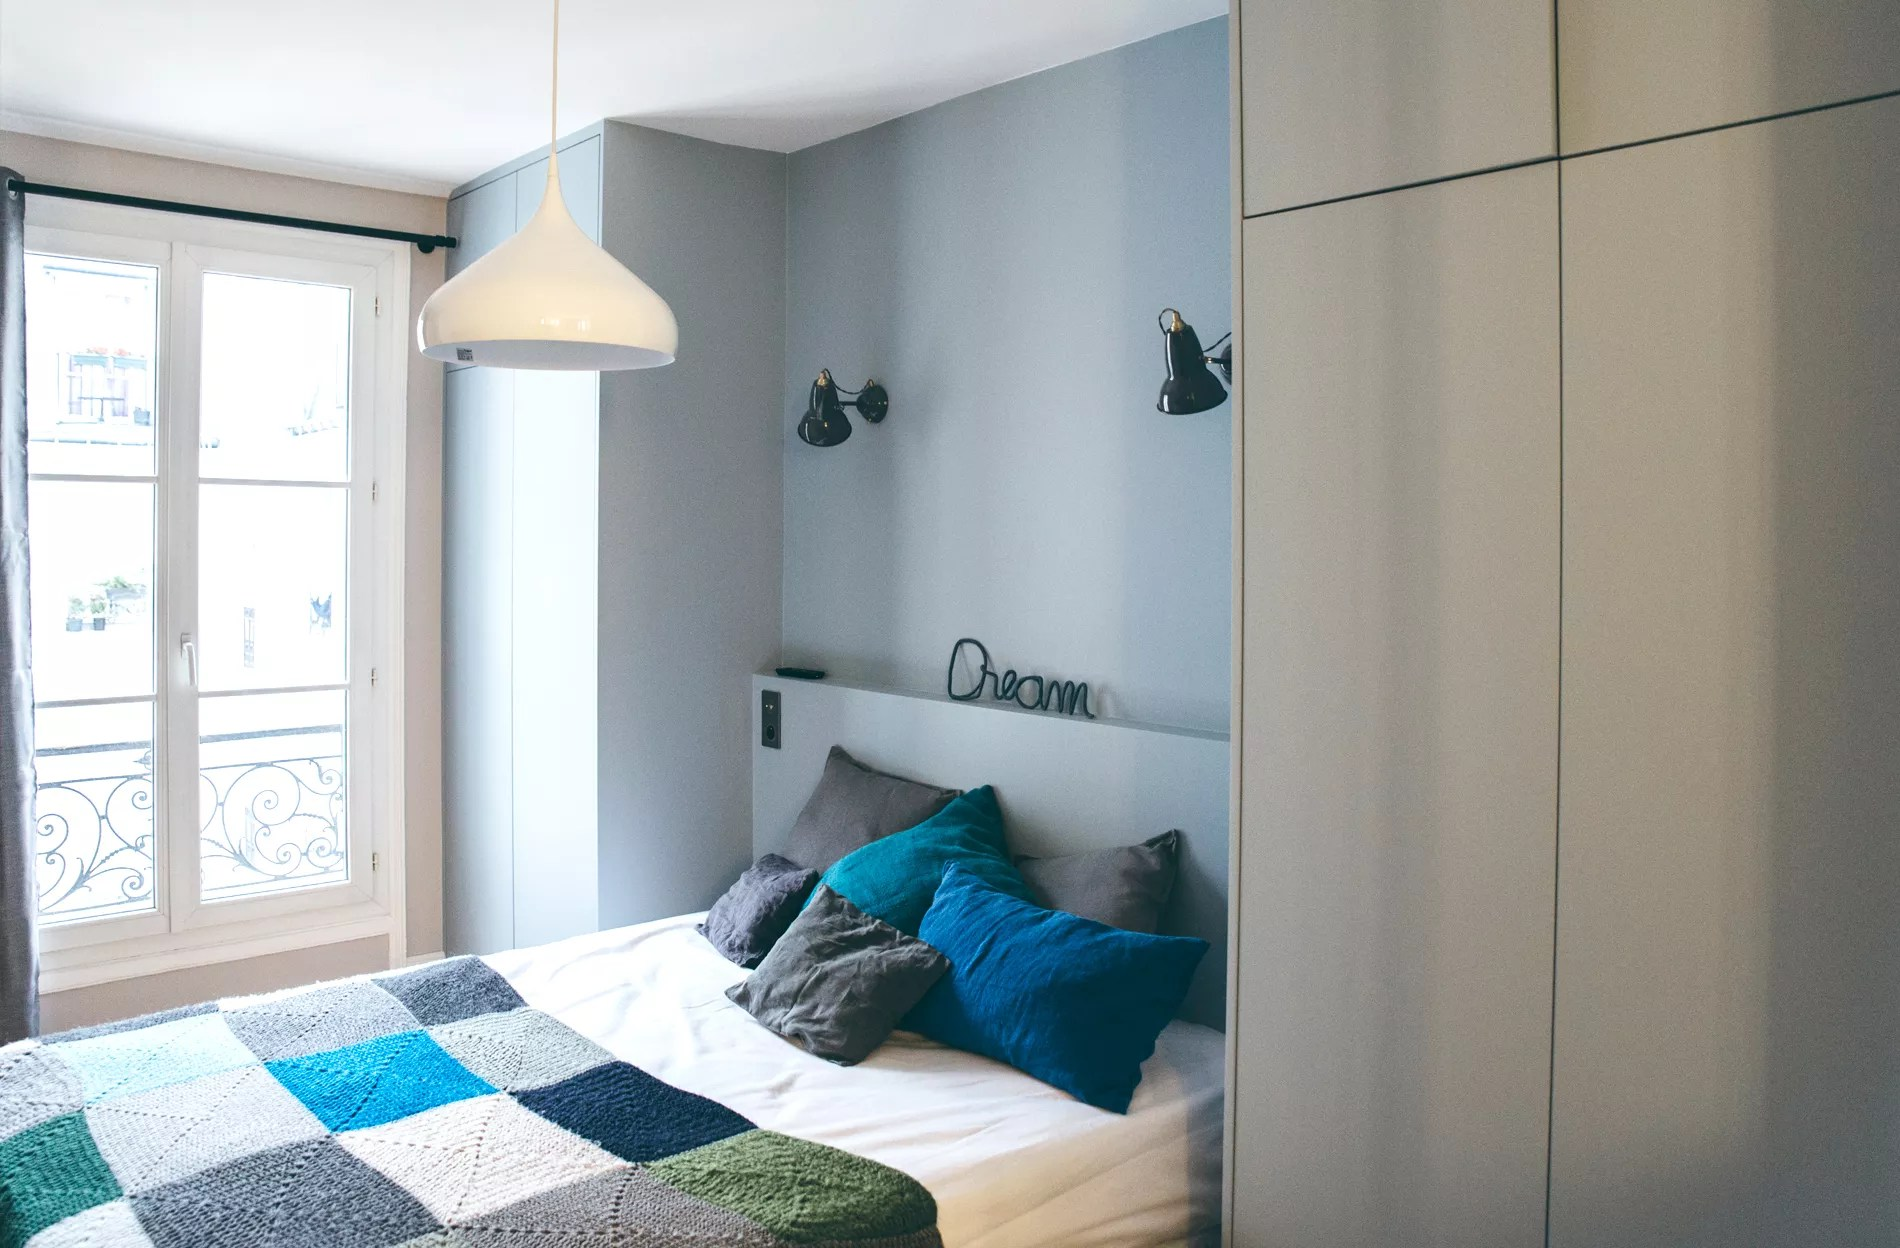 Cinq conseils dco pour optimiser une petite chambre  Madame Figaro